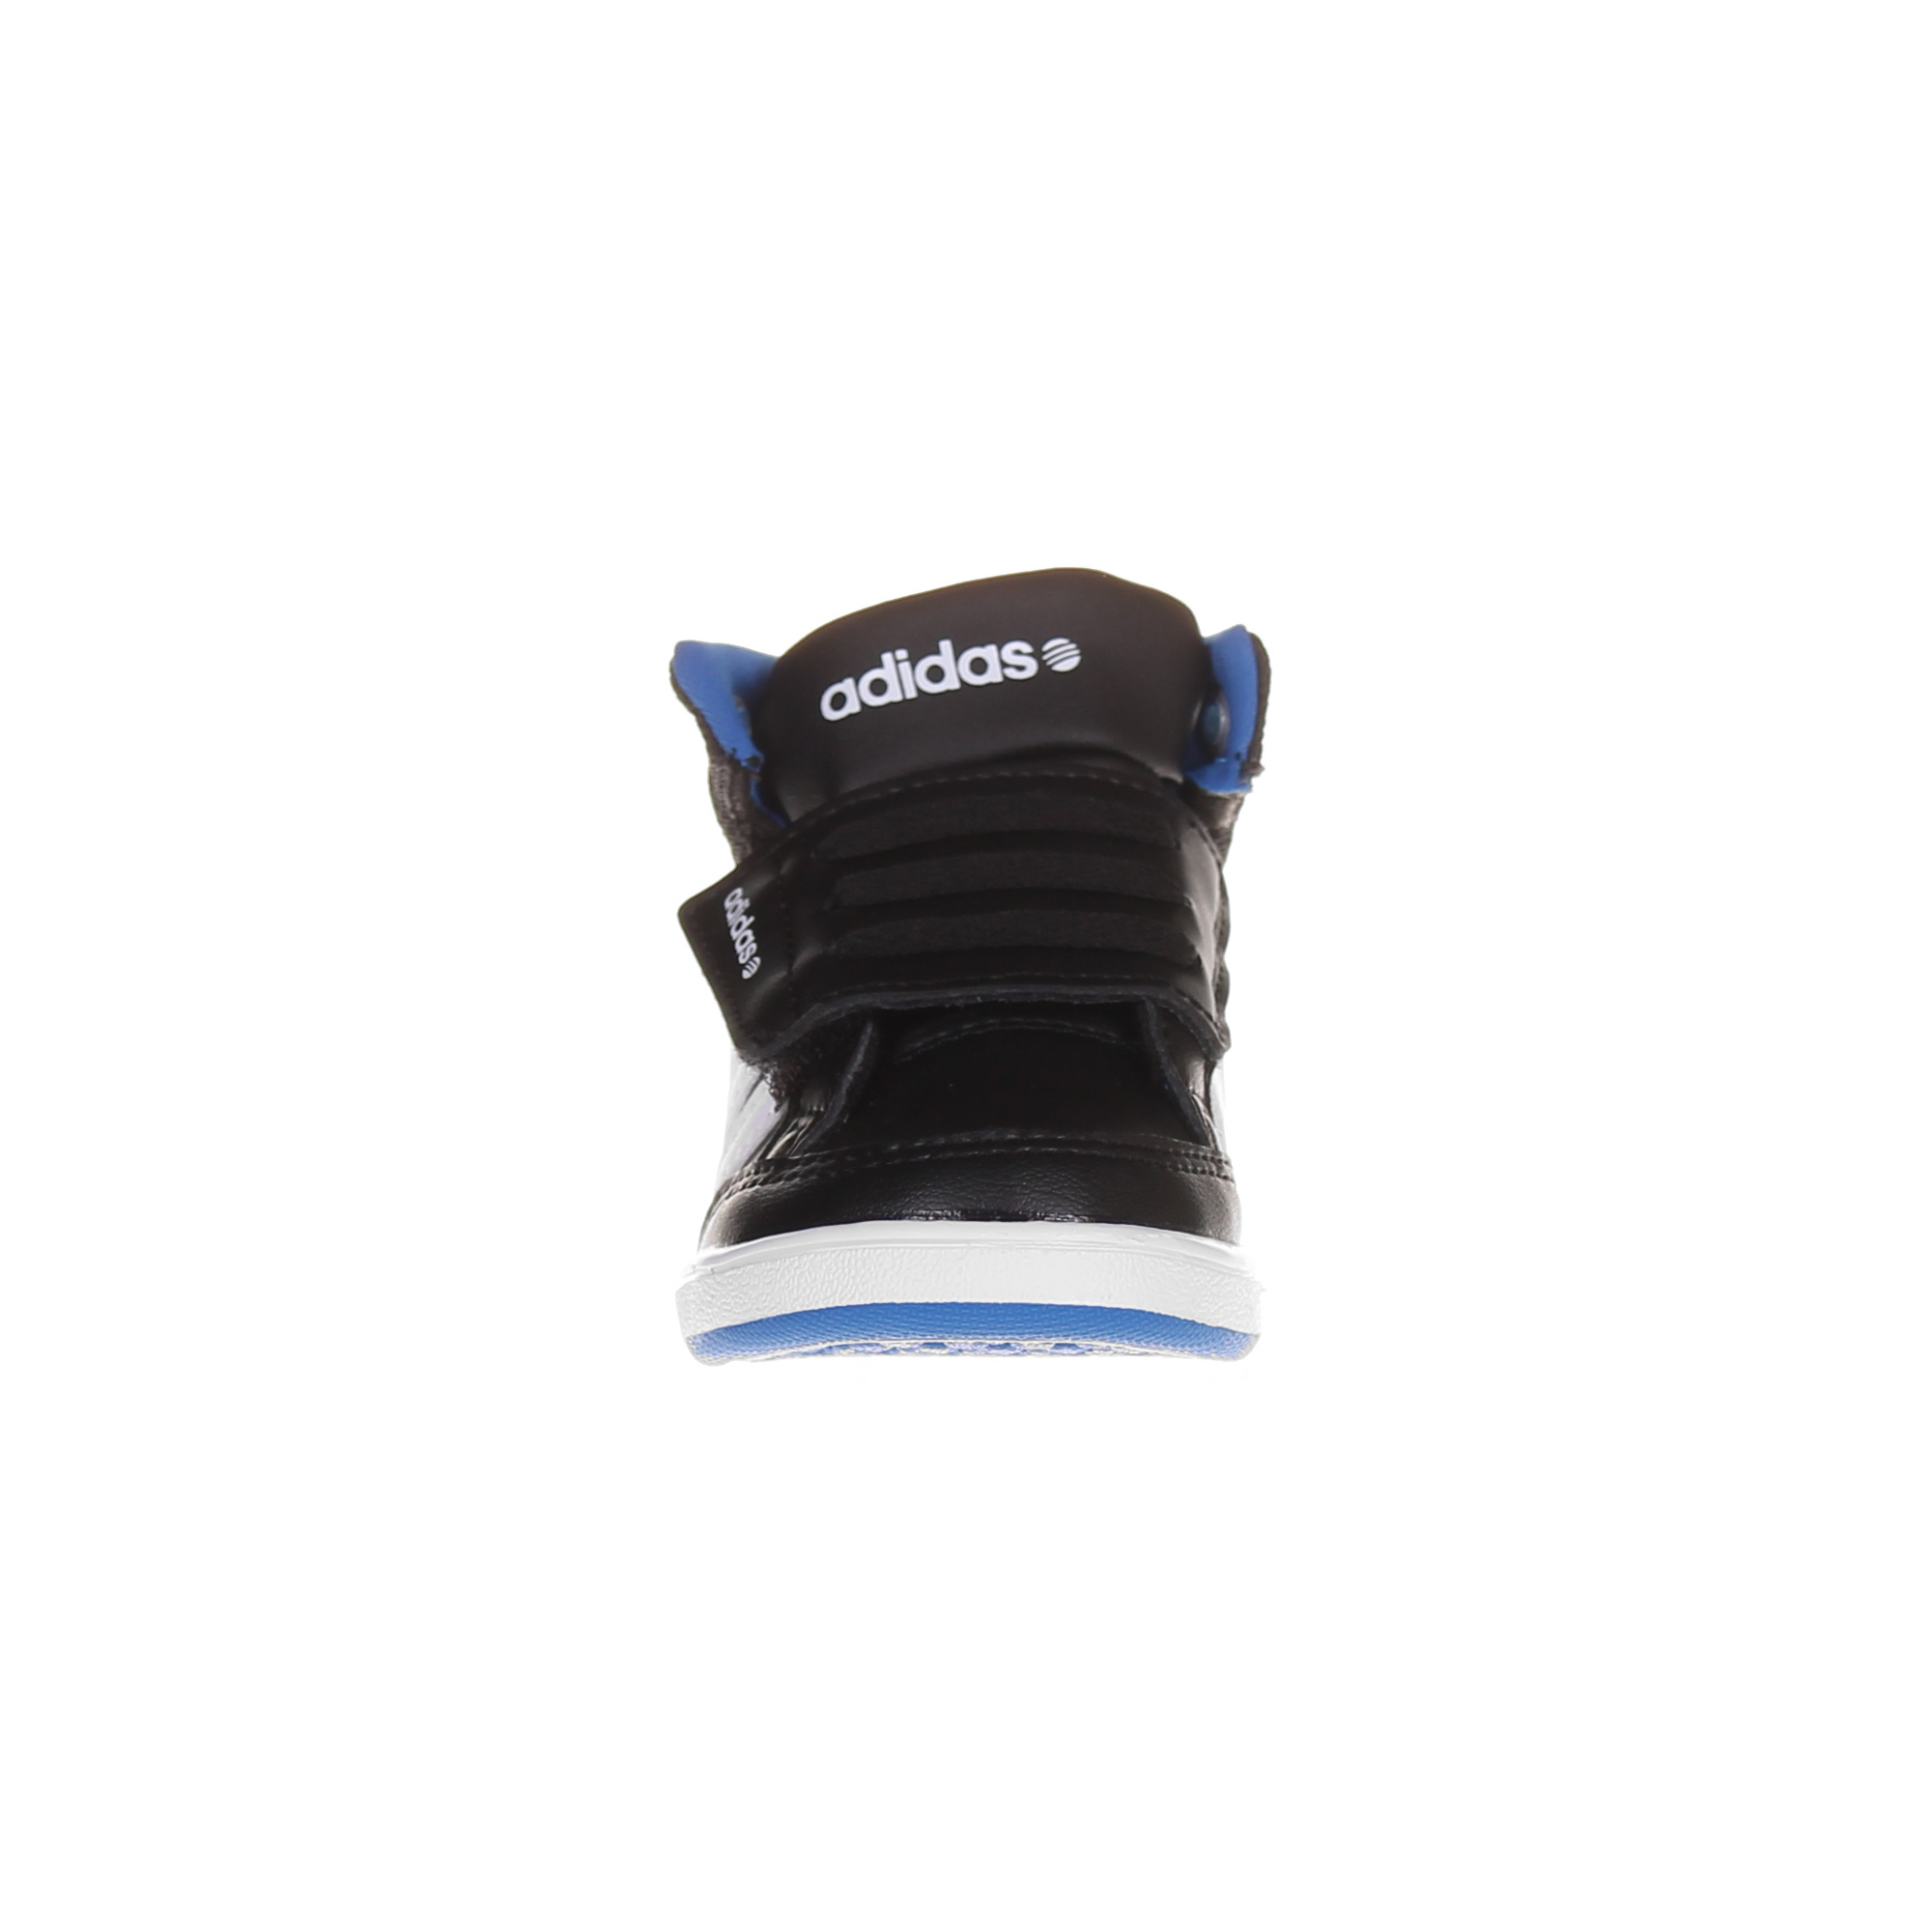 Adidas Neo Kids